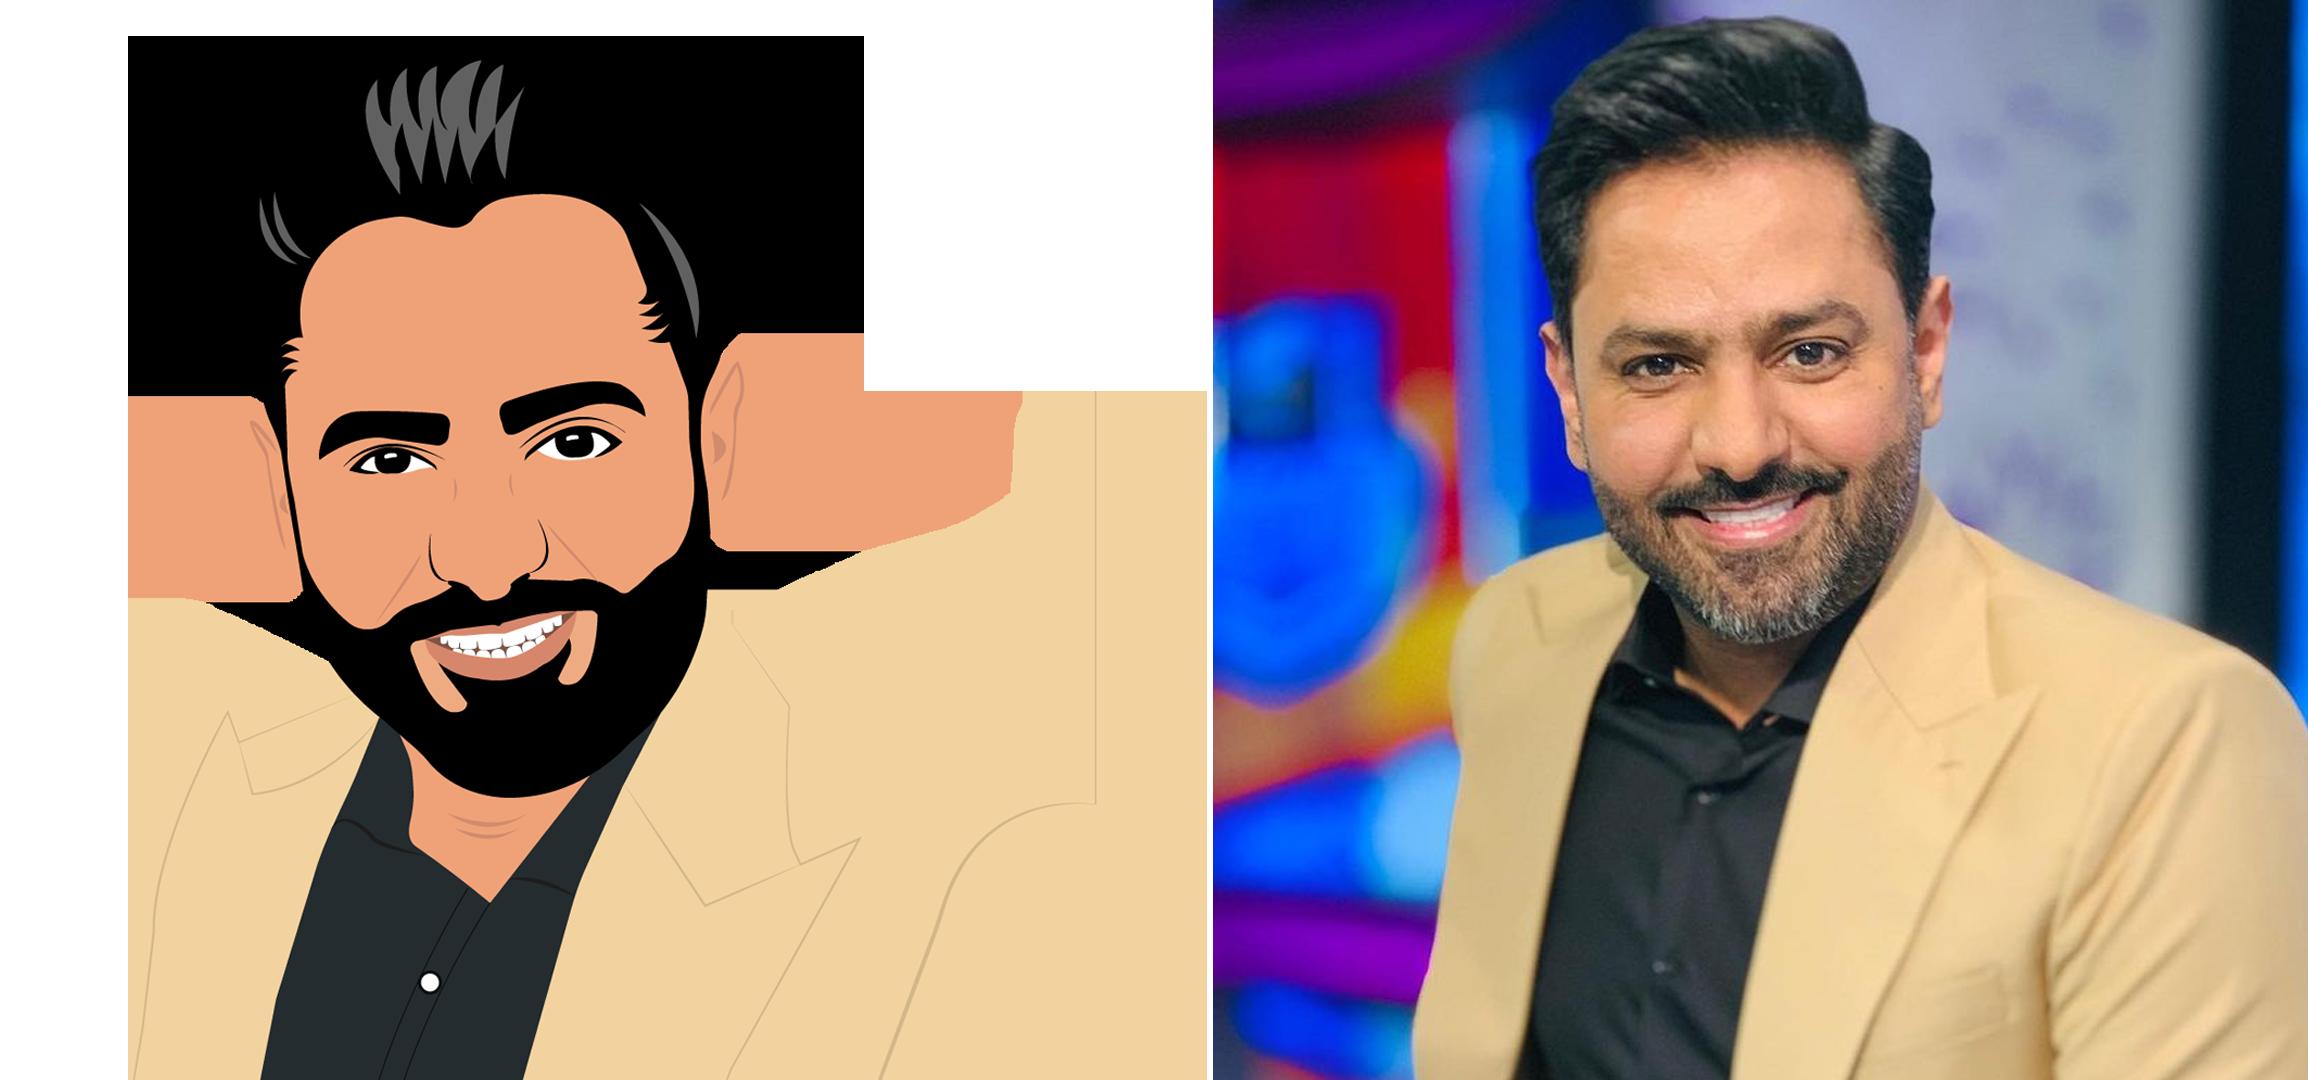 I will convert your photo to cartoon